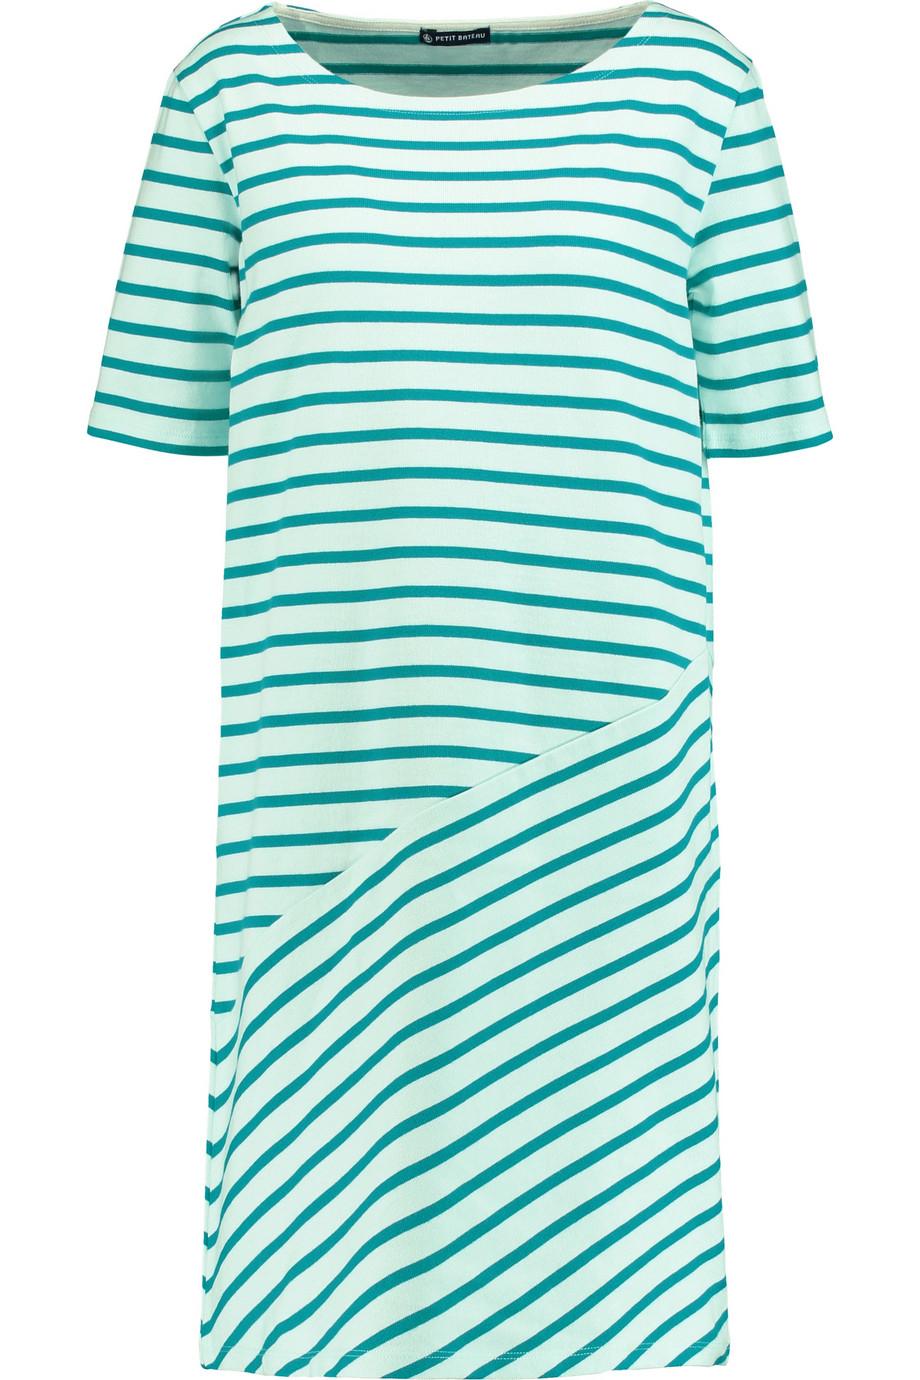 Petit bateau striped cotton dress in blue lyst for Petit bateau striped shirt